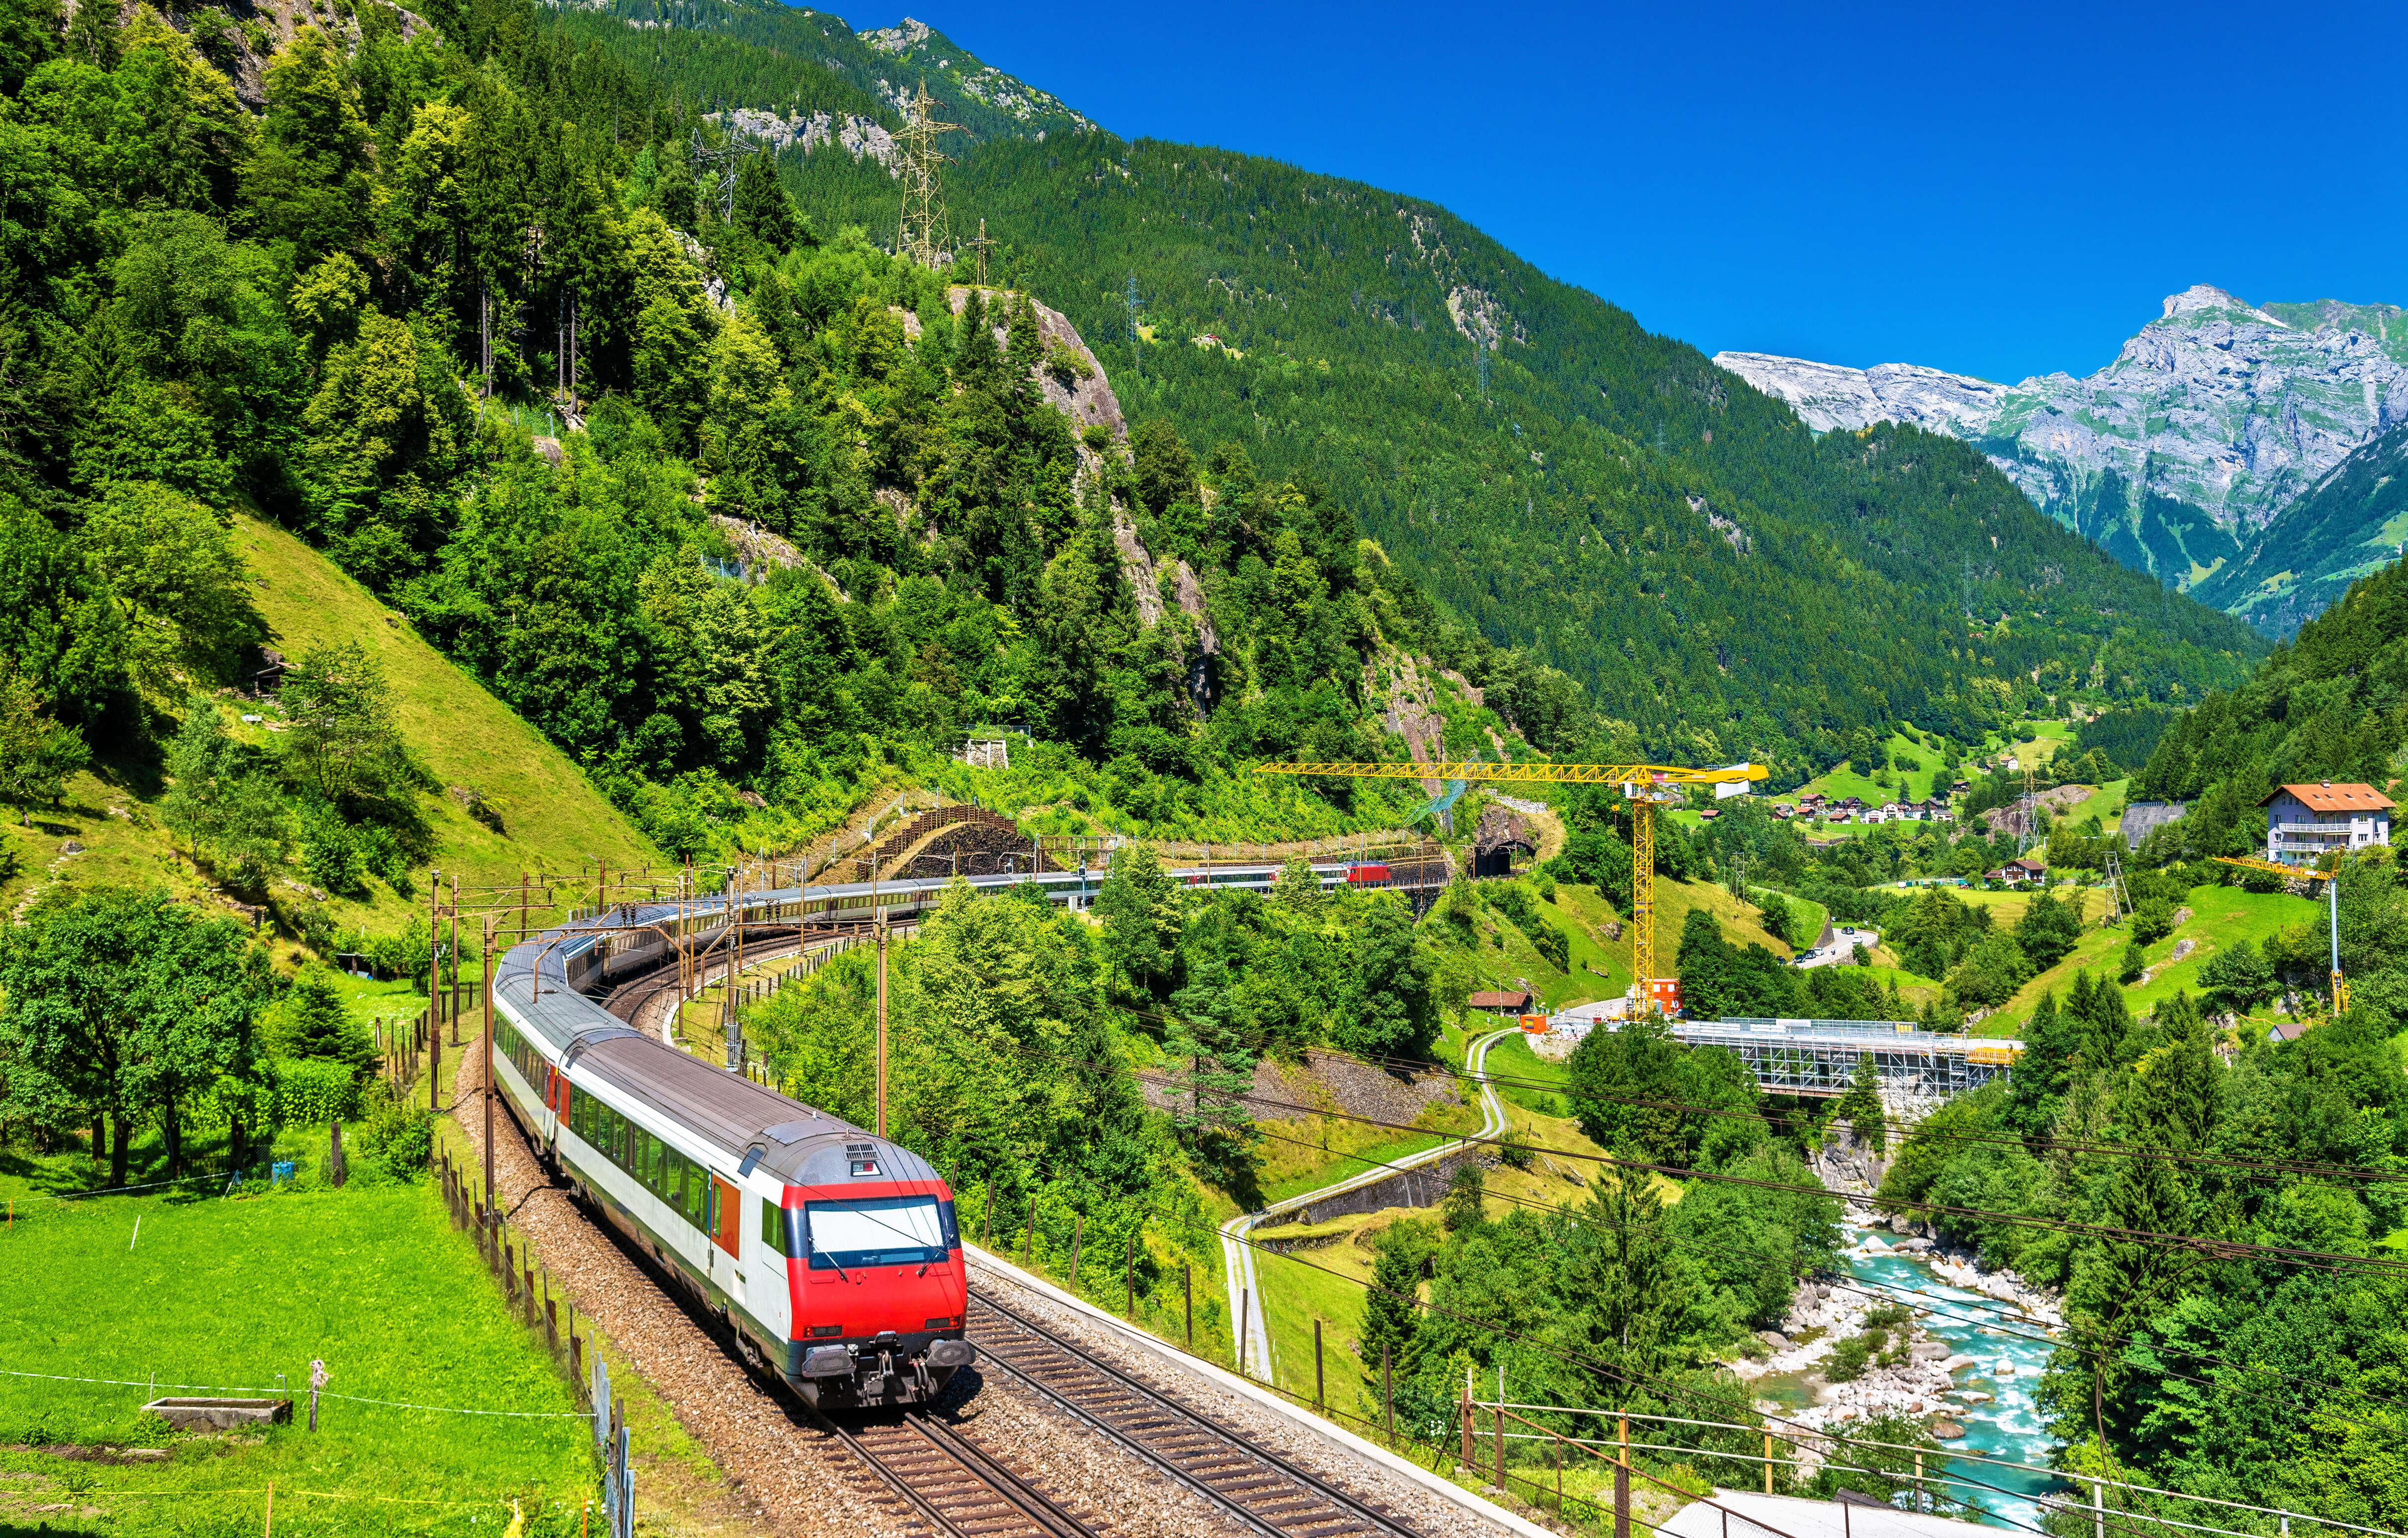 Switzerland: Hidden Trails & Majestic Peaks